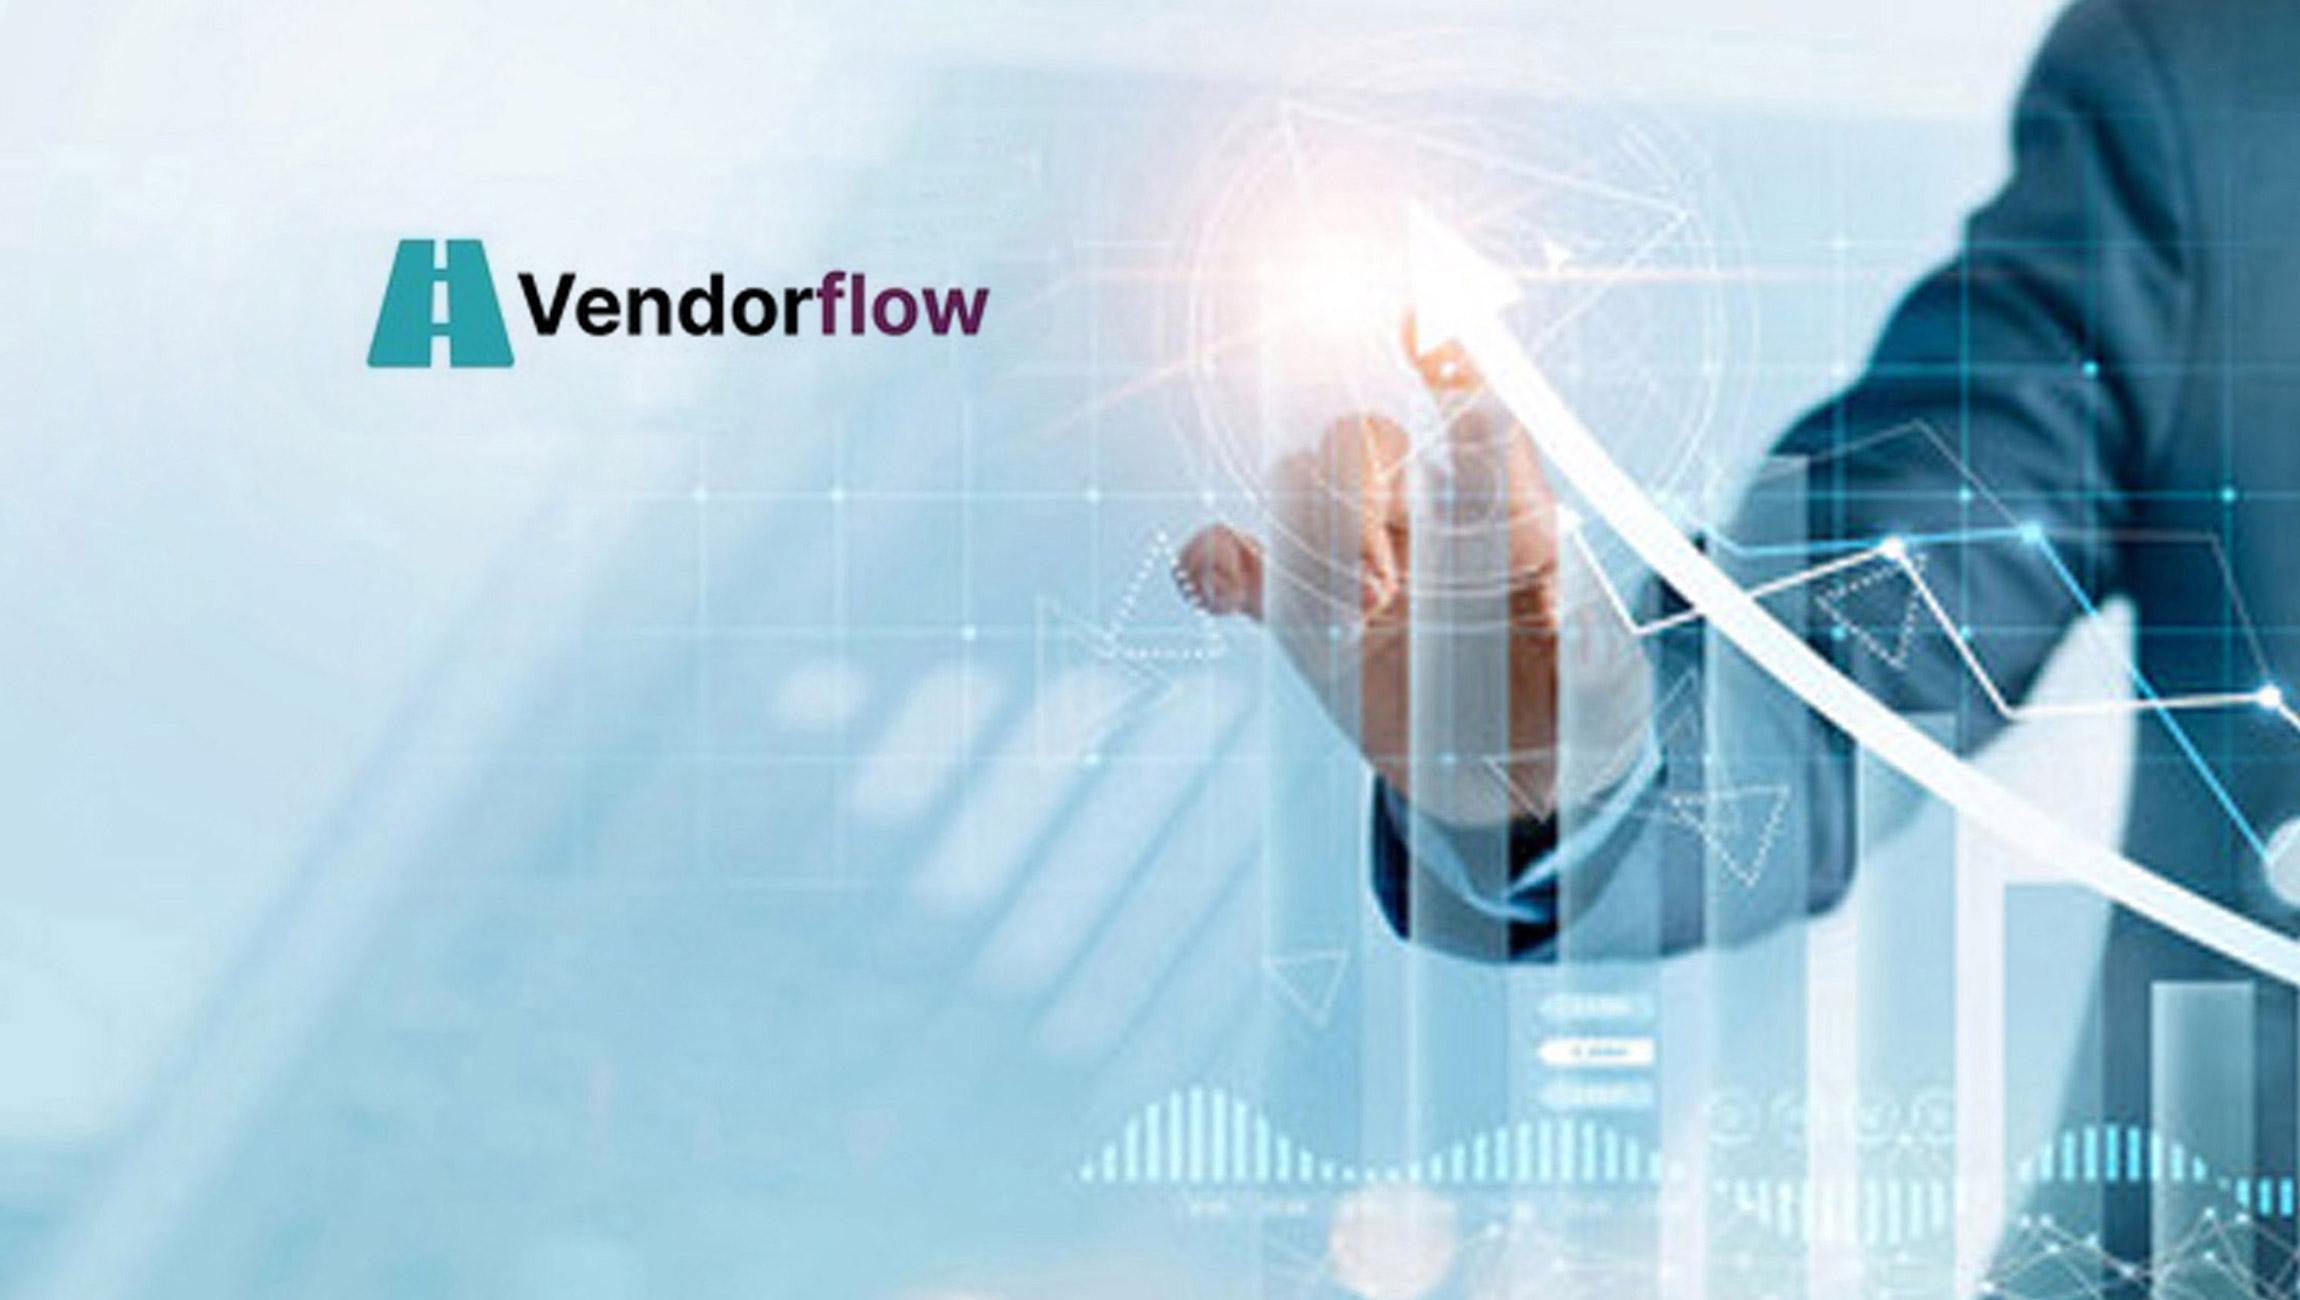 Vendorflow Raises $1.3M to Build the Communications Layer of Logistics